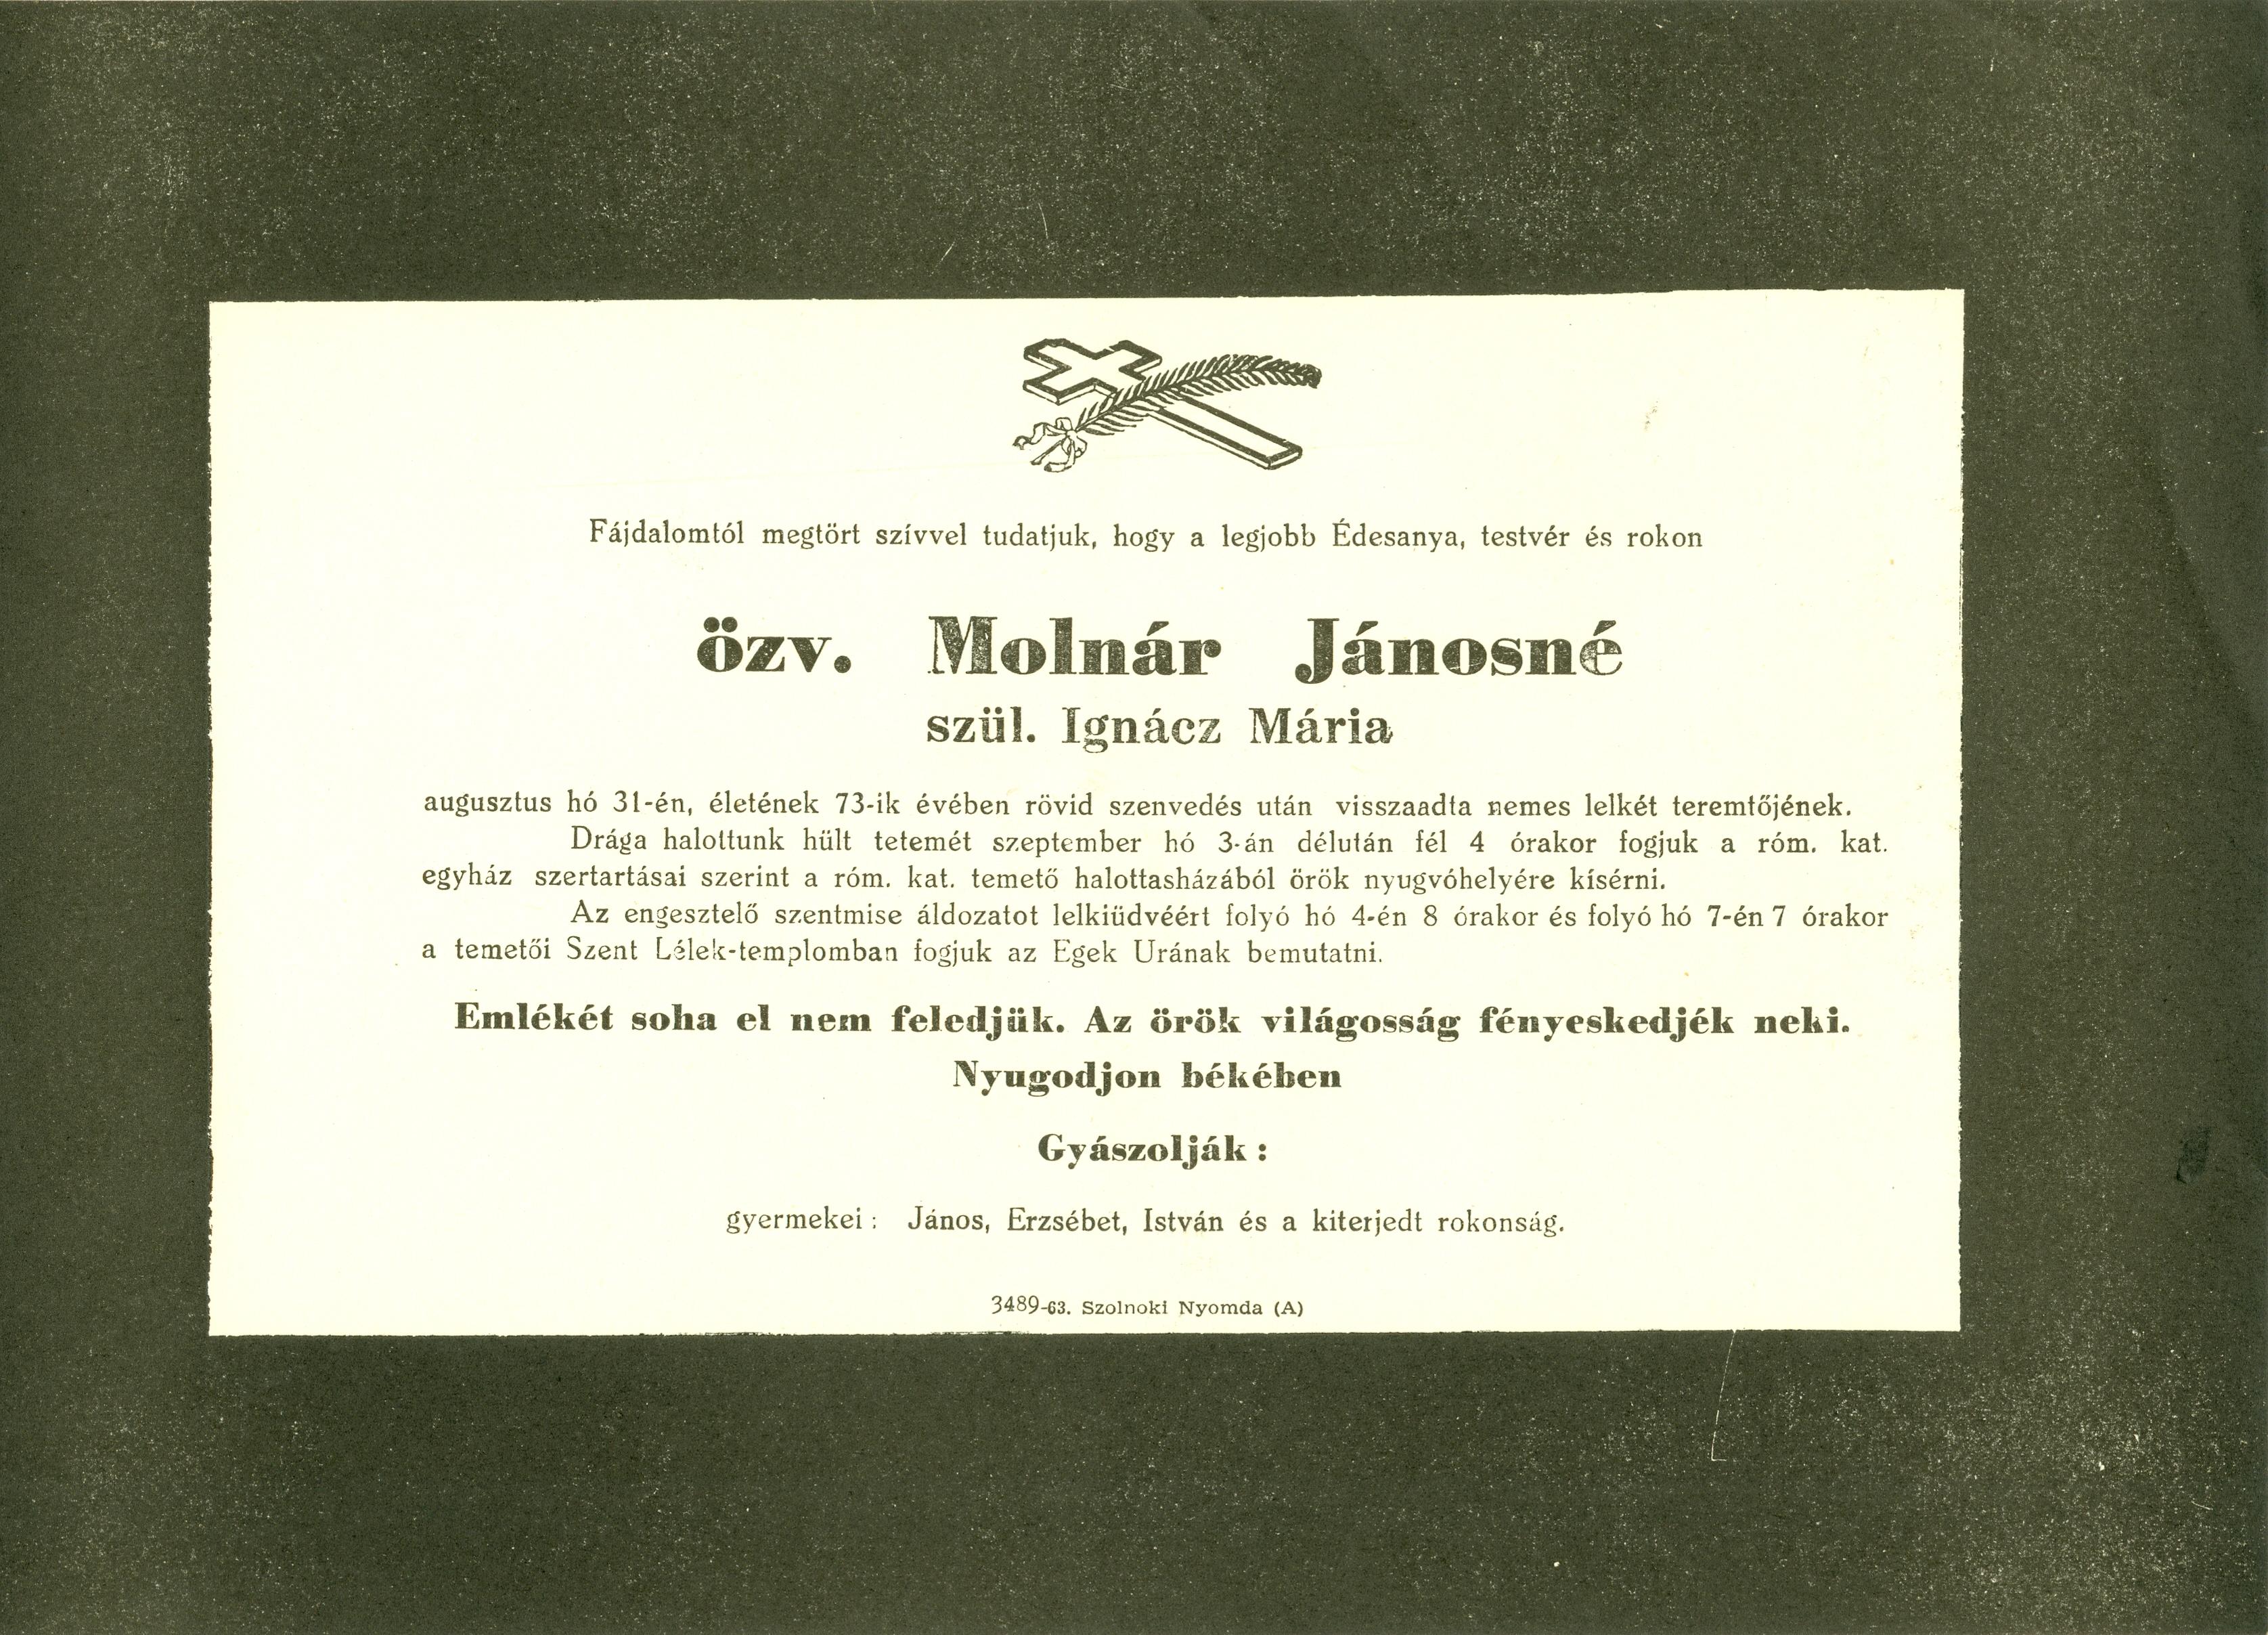 Molnár Jánosné